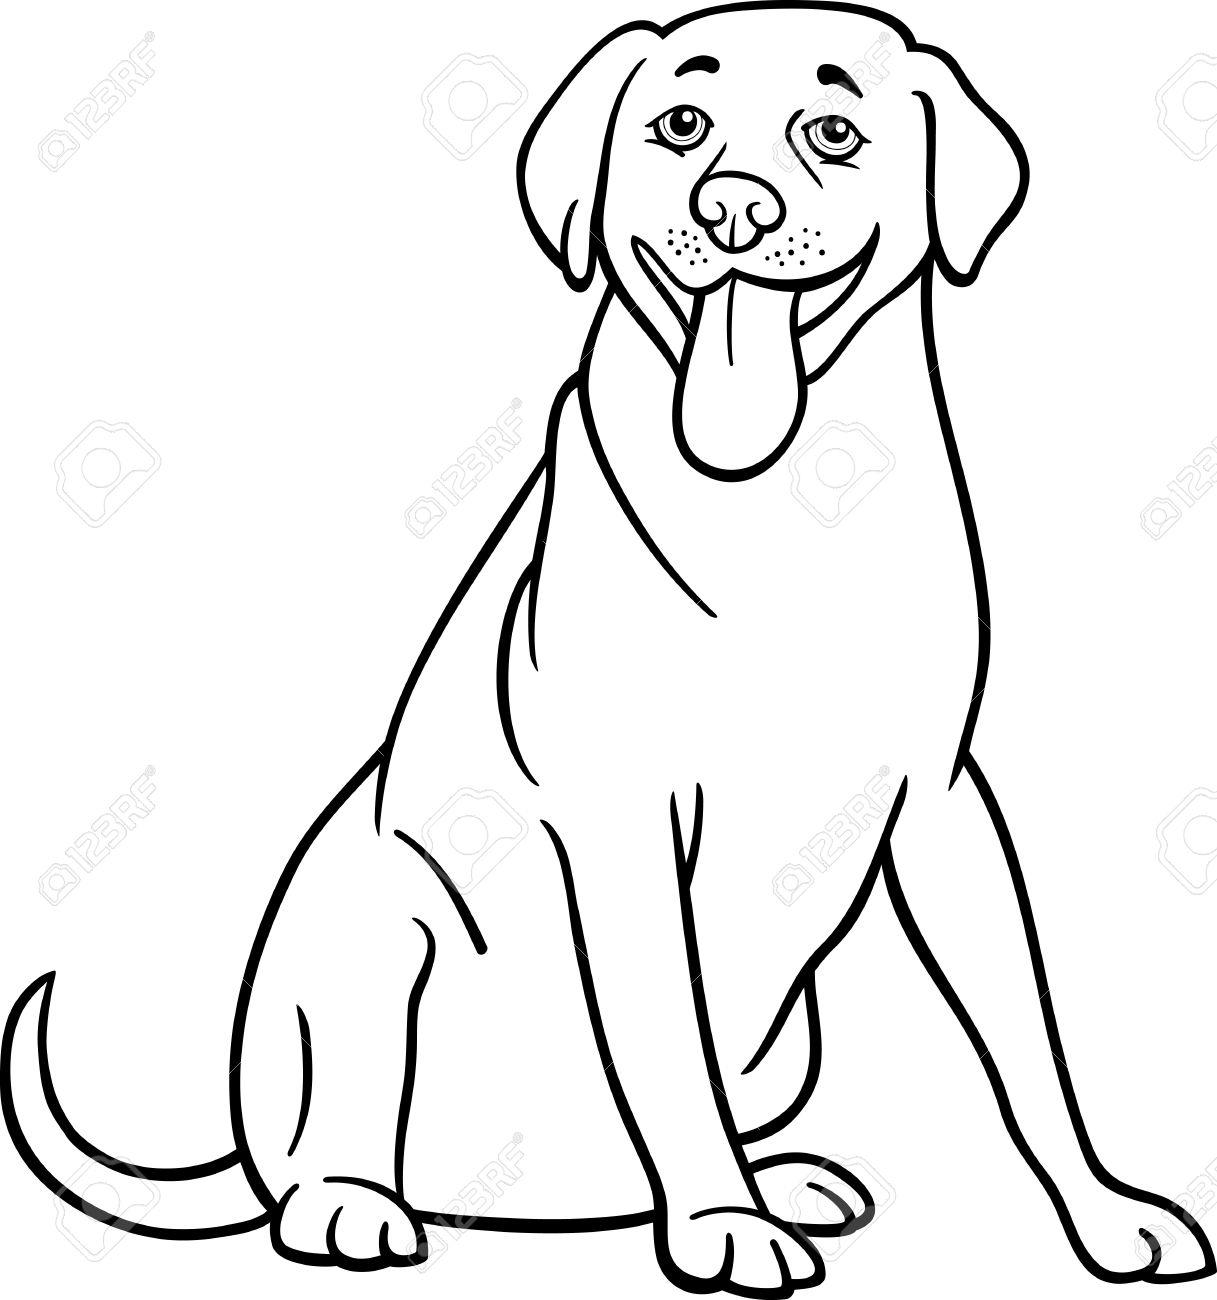 1217x1300 Black And White Dog Drawing 5,026 Labrador Retriever Cliparts